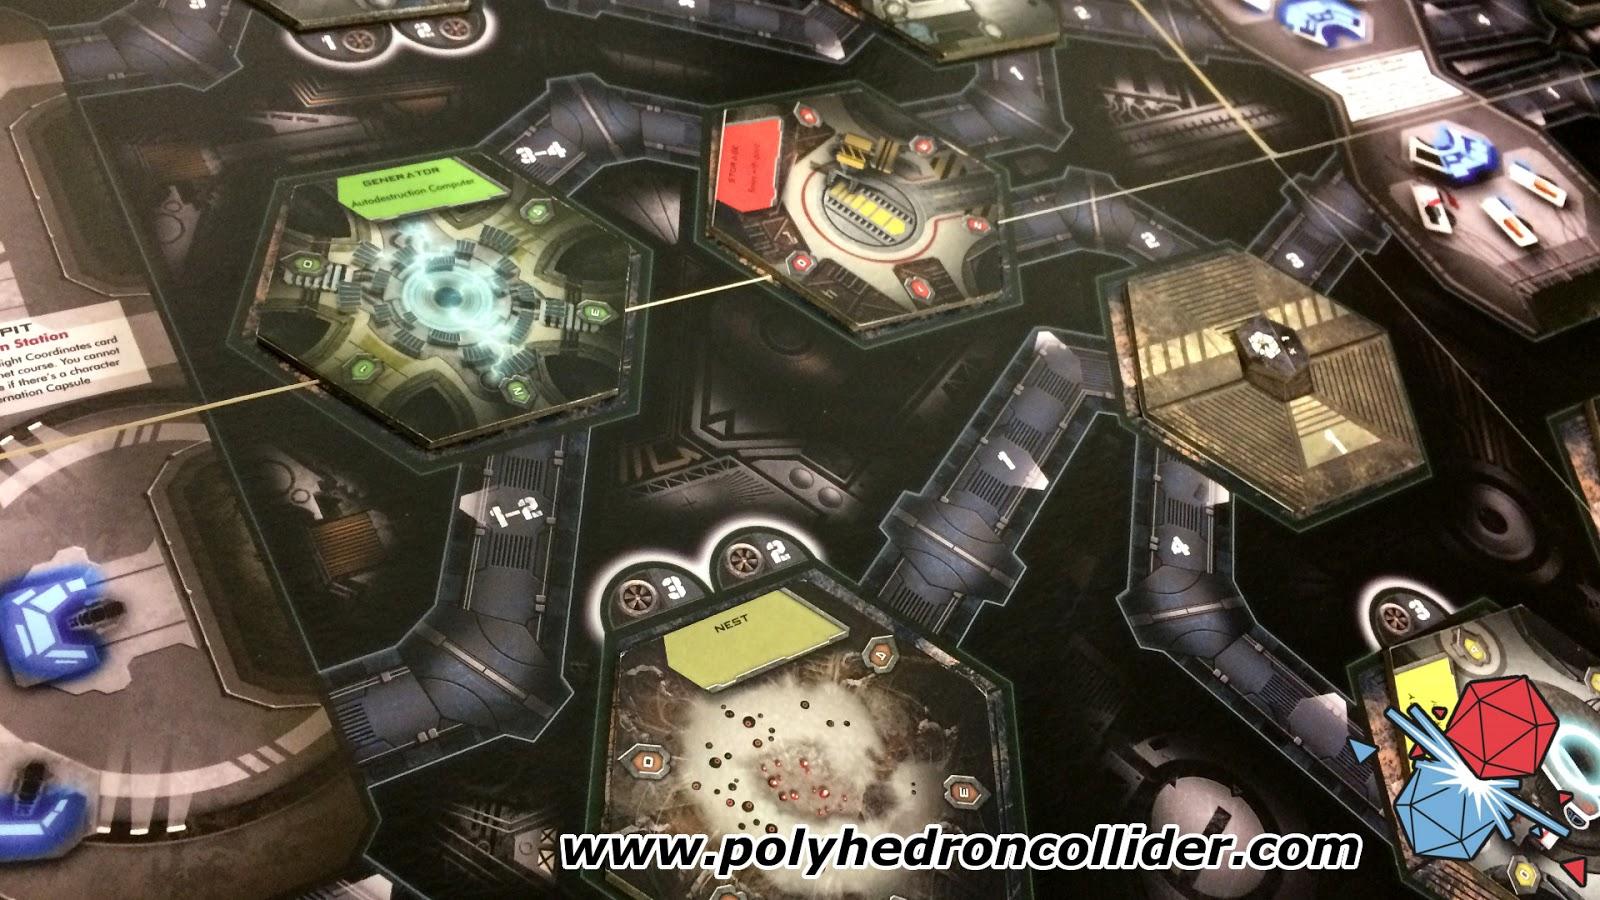 Nemesis system shock board game